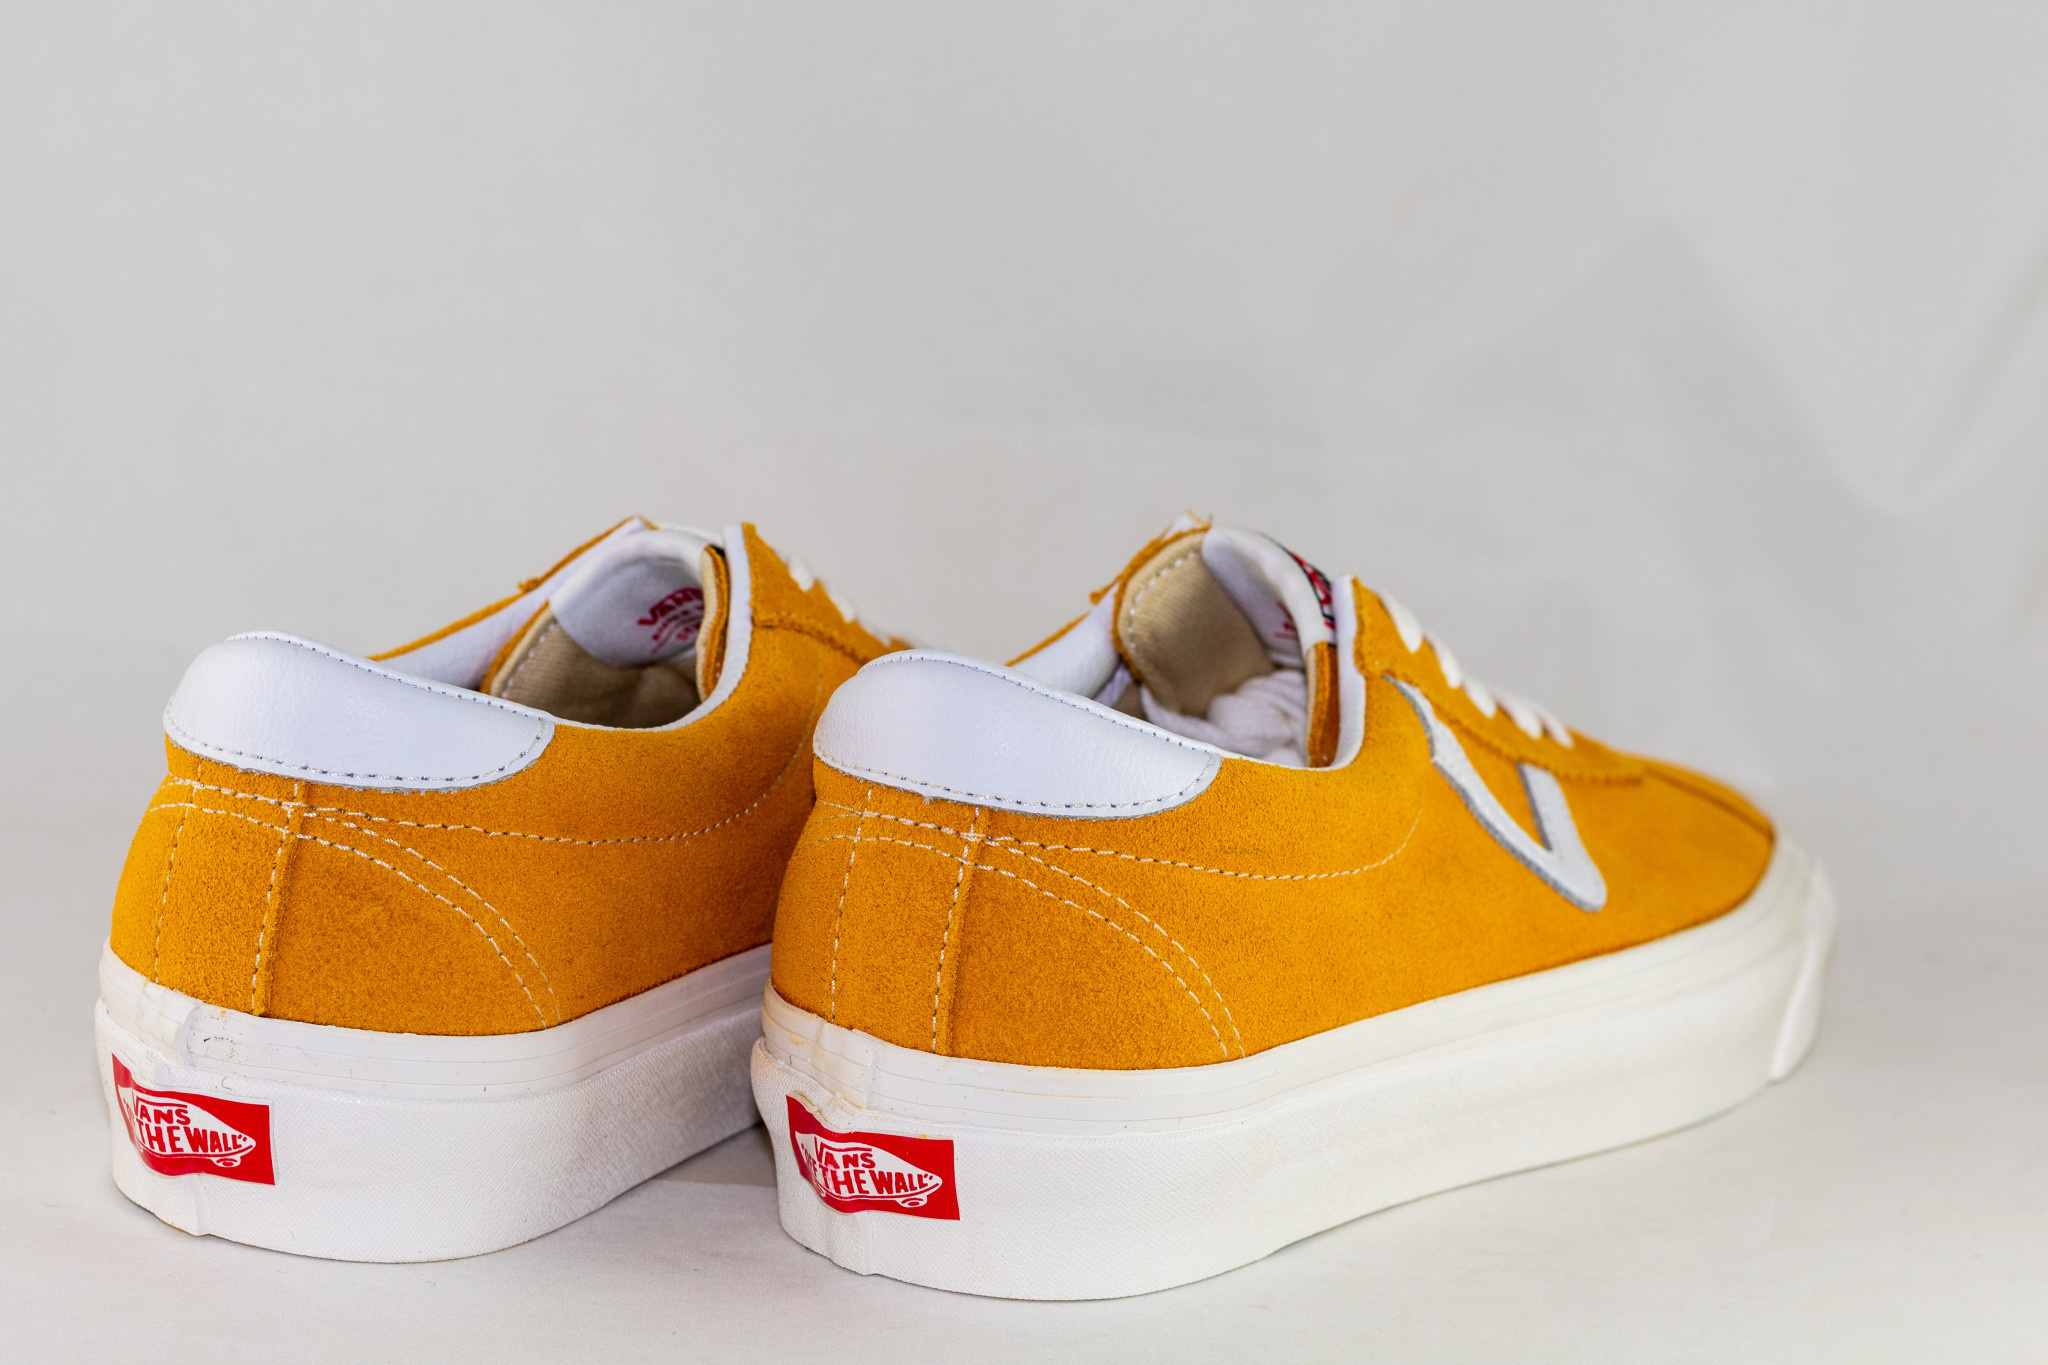 VANS Style 73 DX  (Anaheim Factory) Og Saffron